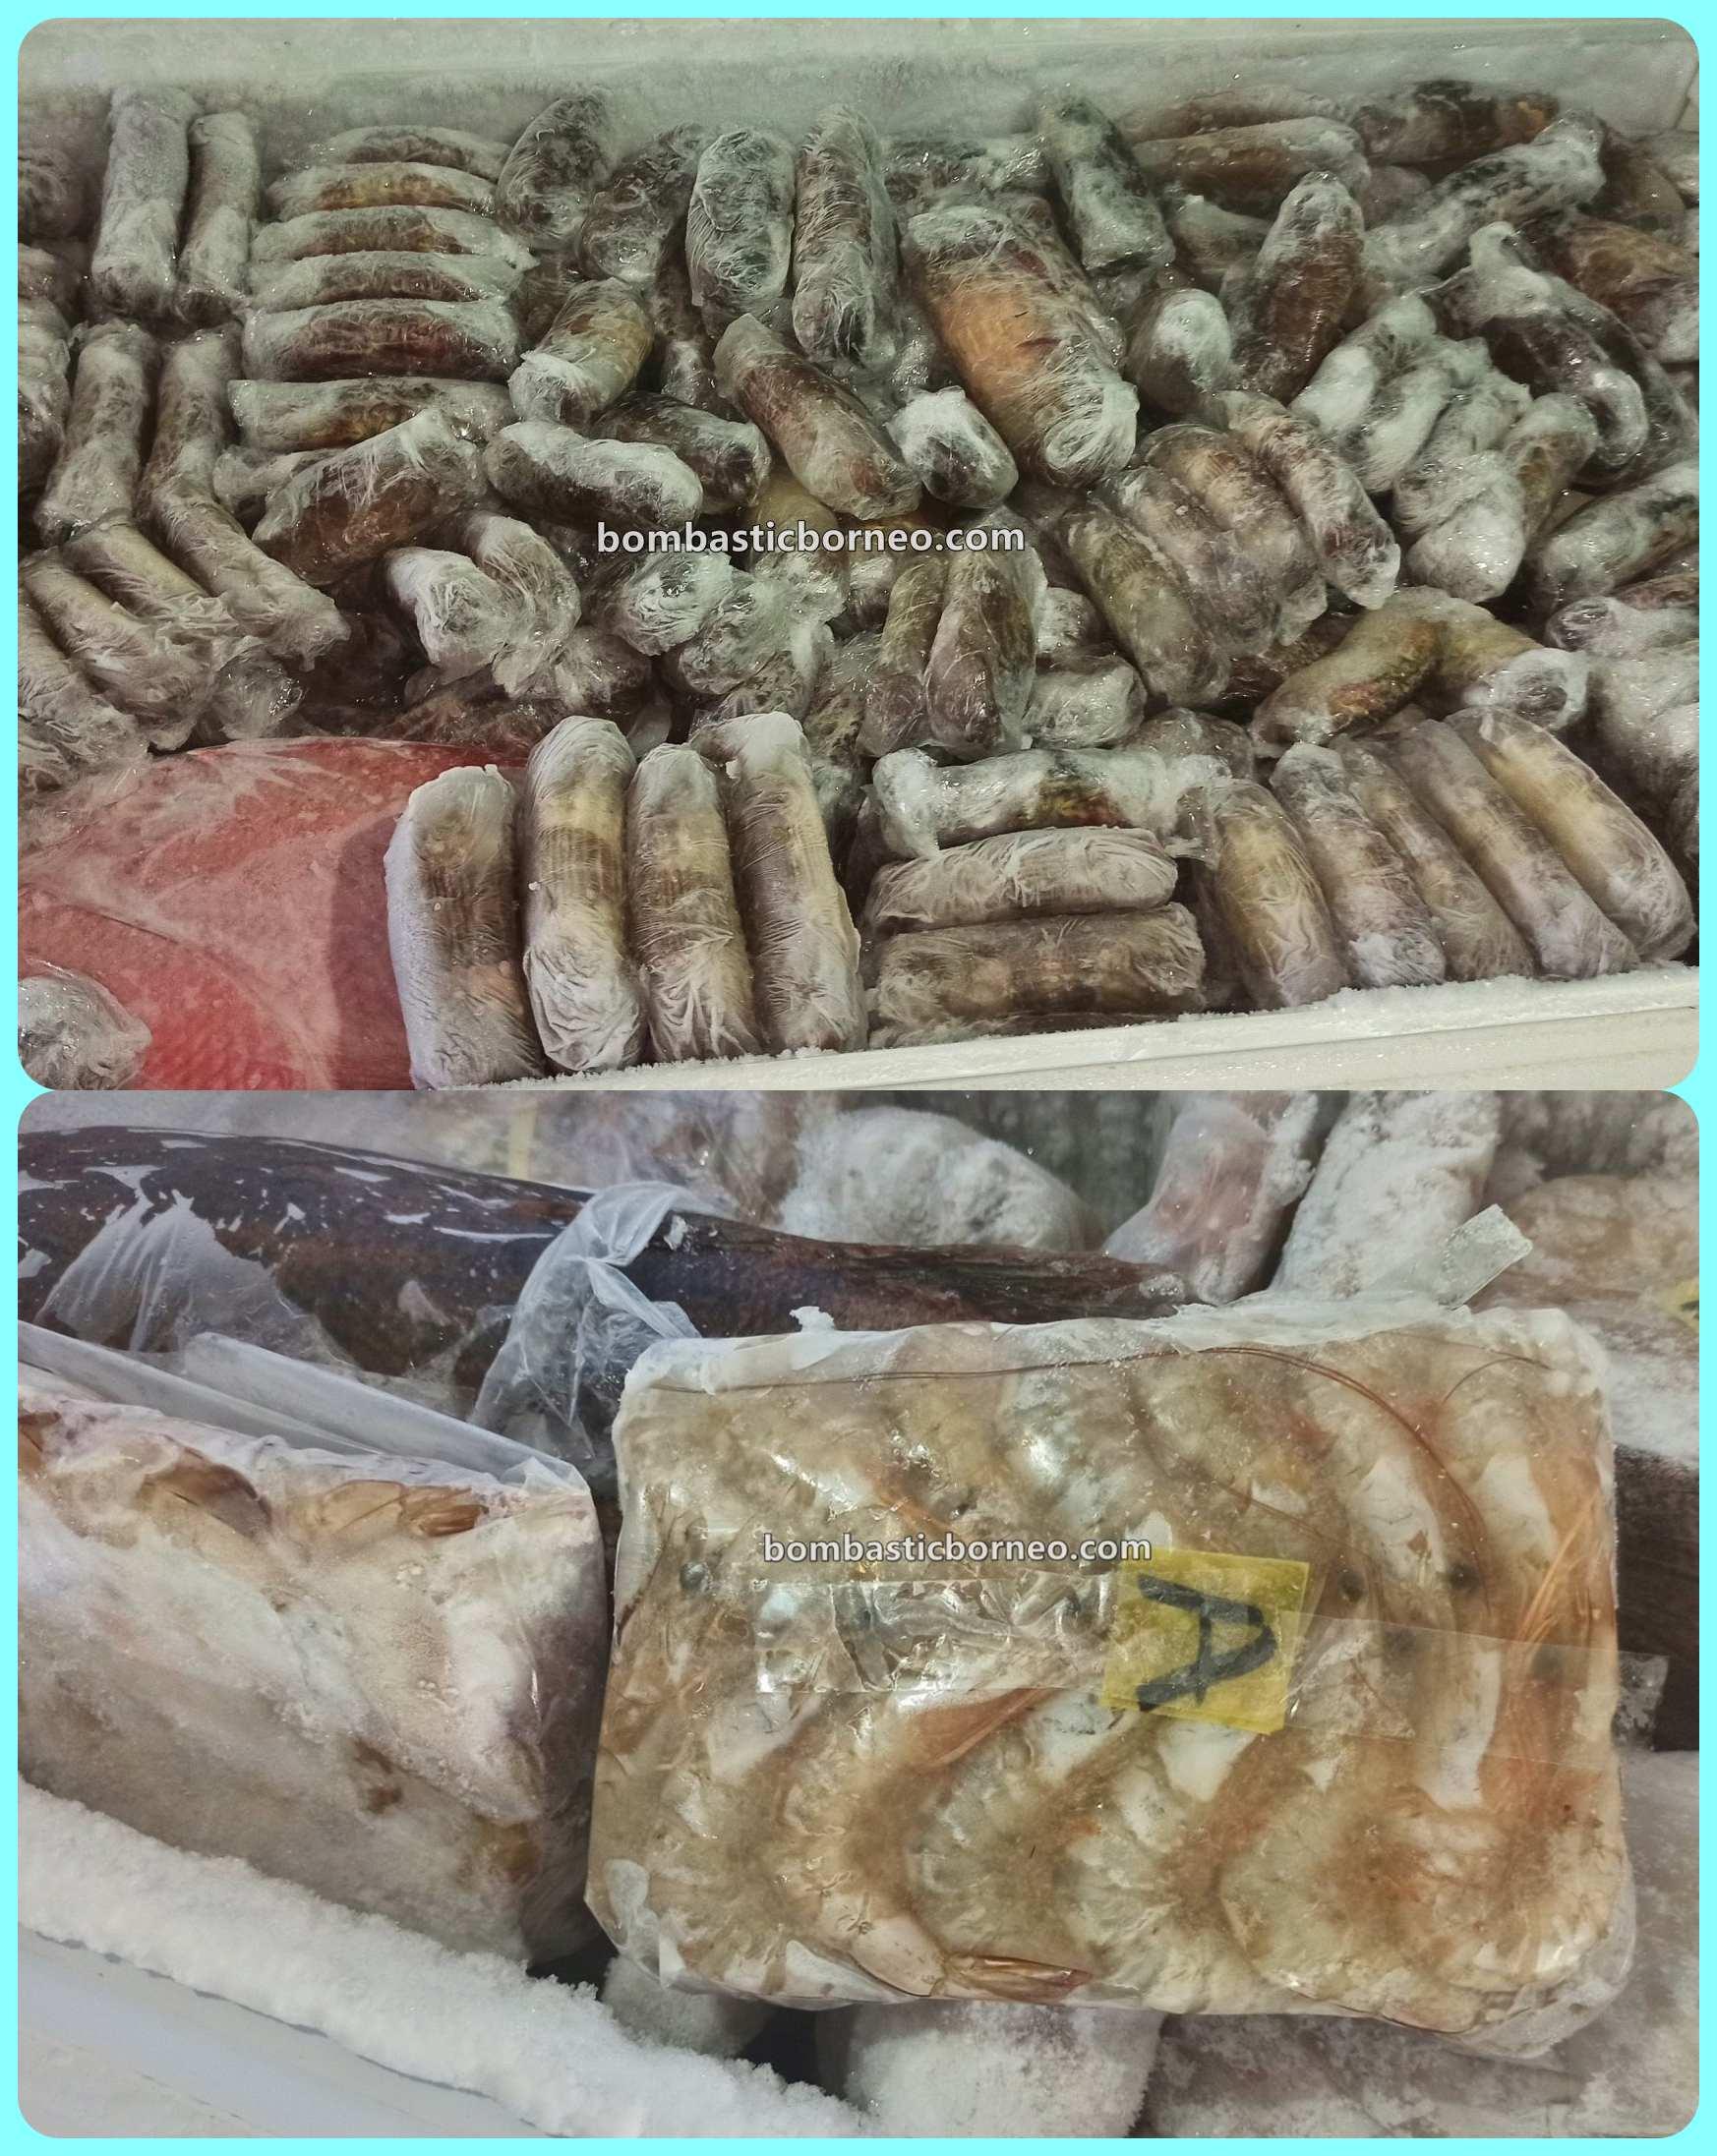 Kepiting Soka, Soft Shell Crab Farm, backpackers, destination, Exotic Food, exploration, Kaltara, Pariwisata, tourist attraction, travel guide, 北加里曼丹打拉根, 印尼软壳螃蟹养殖场